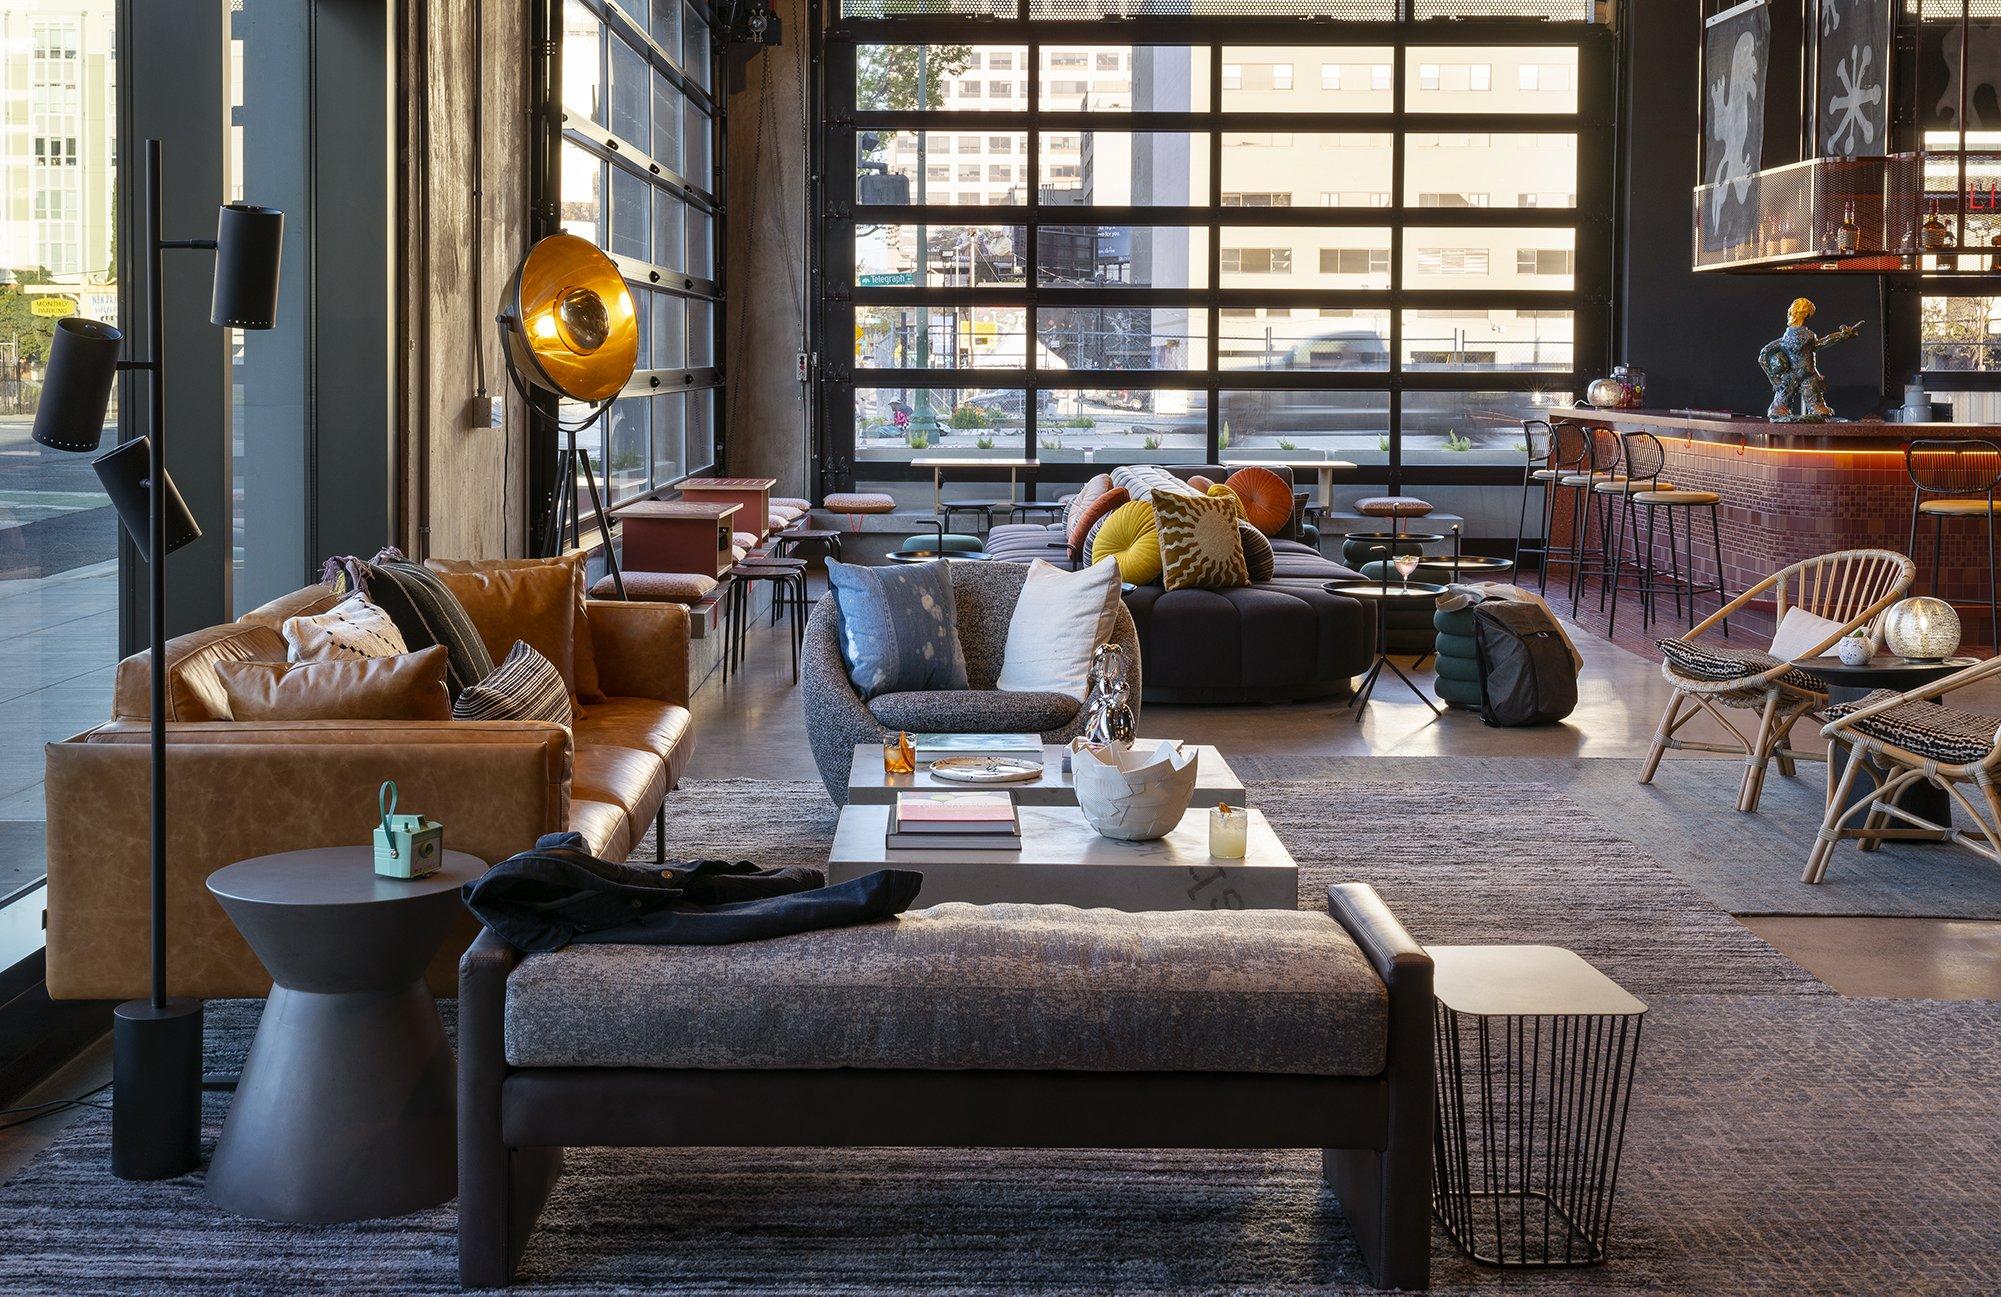 Moxy Hotel-Oakland, CA-Lowney Architecture-4